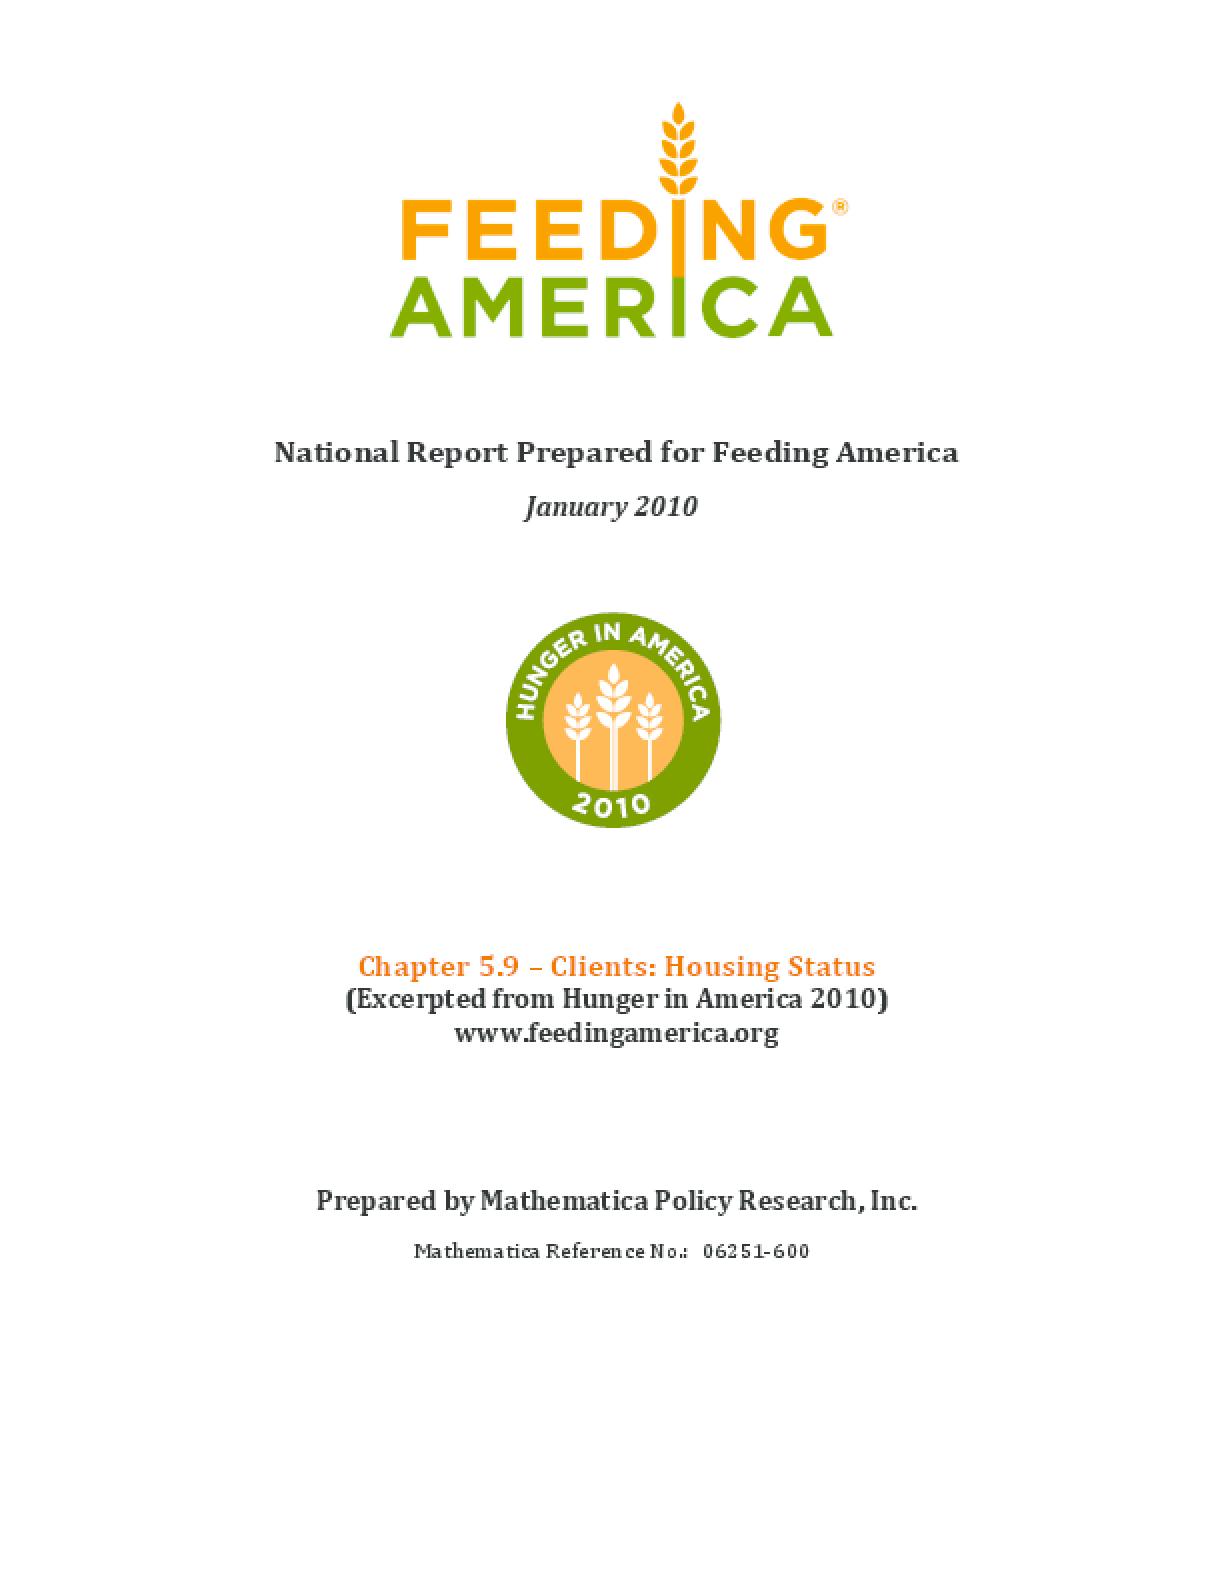 Feeding America Client Demographics: Housing Status